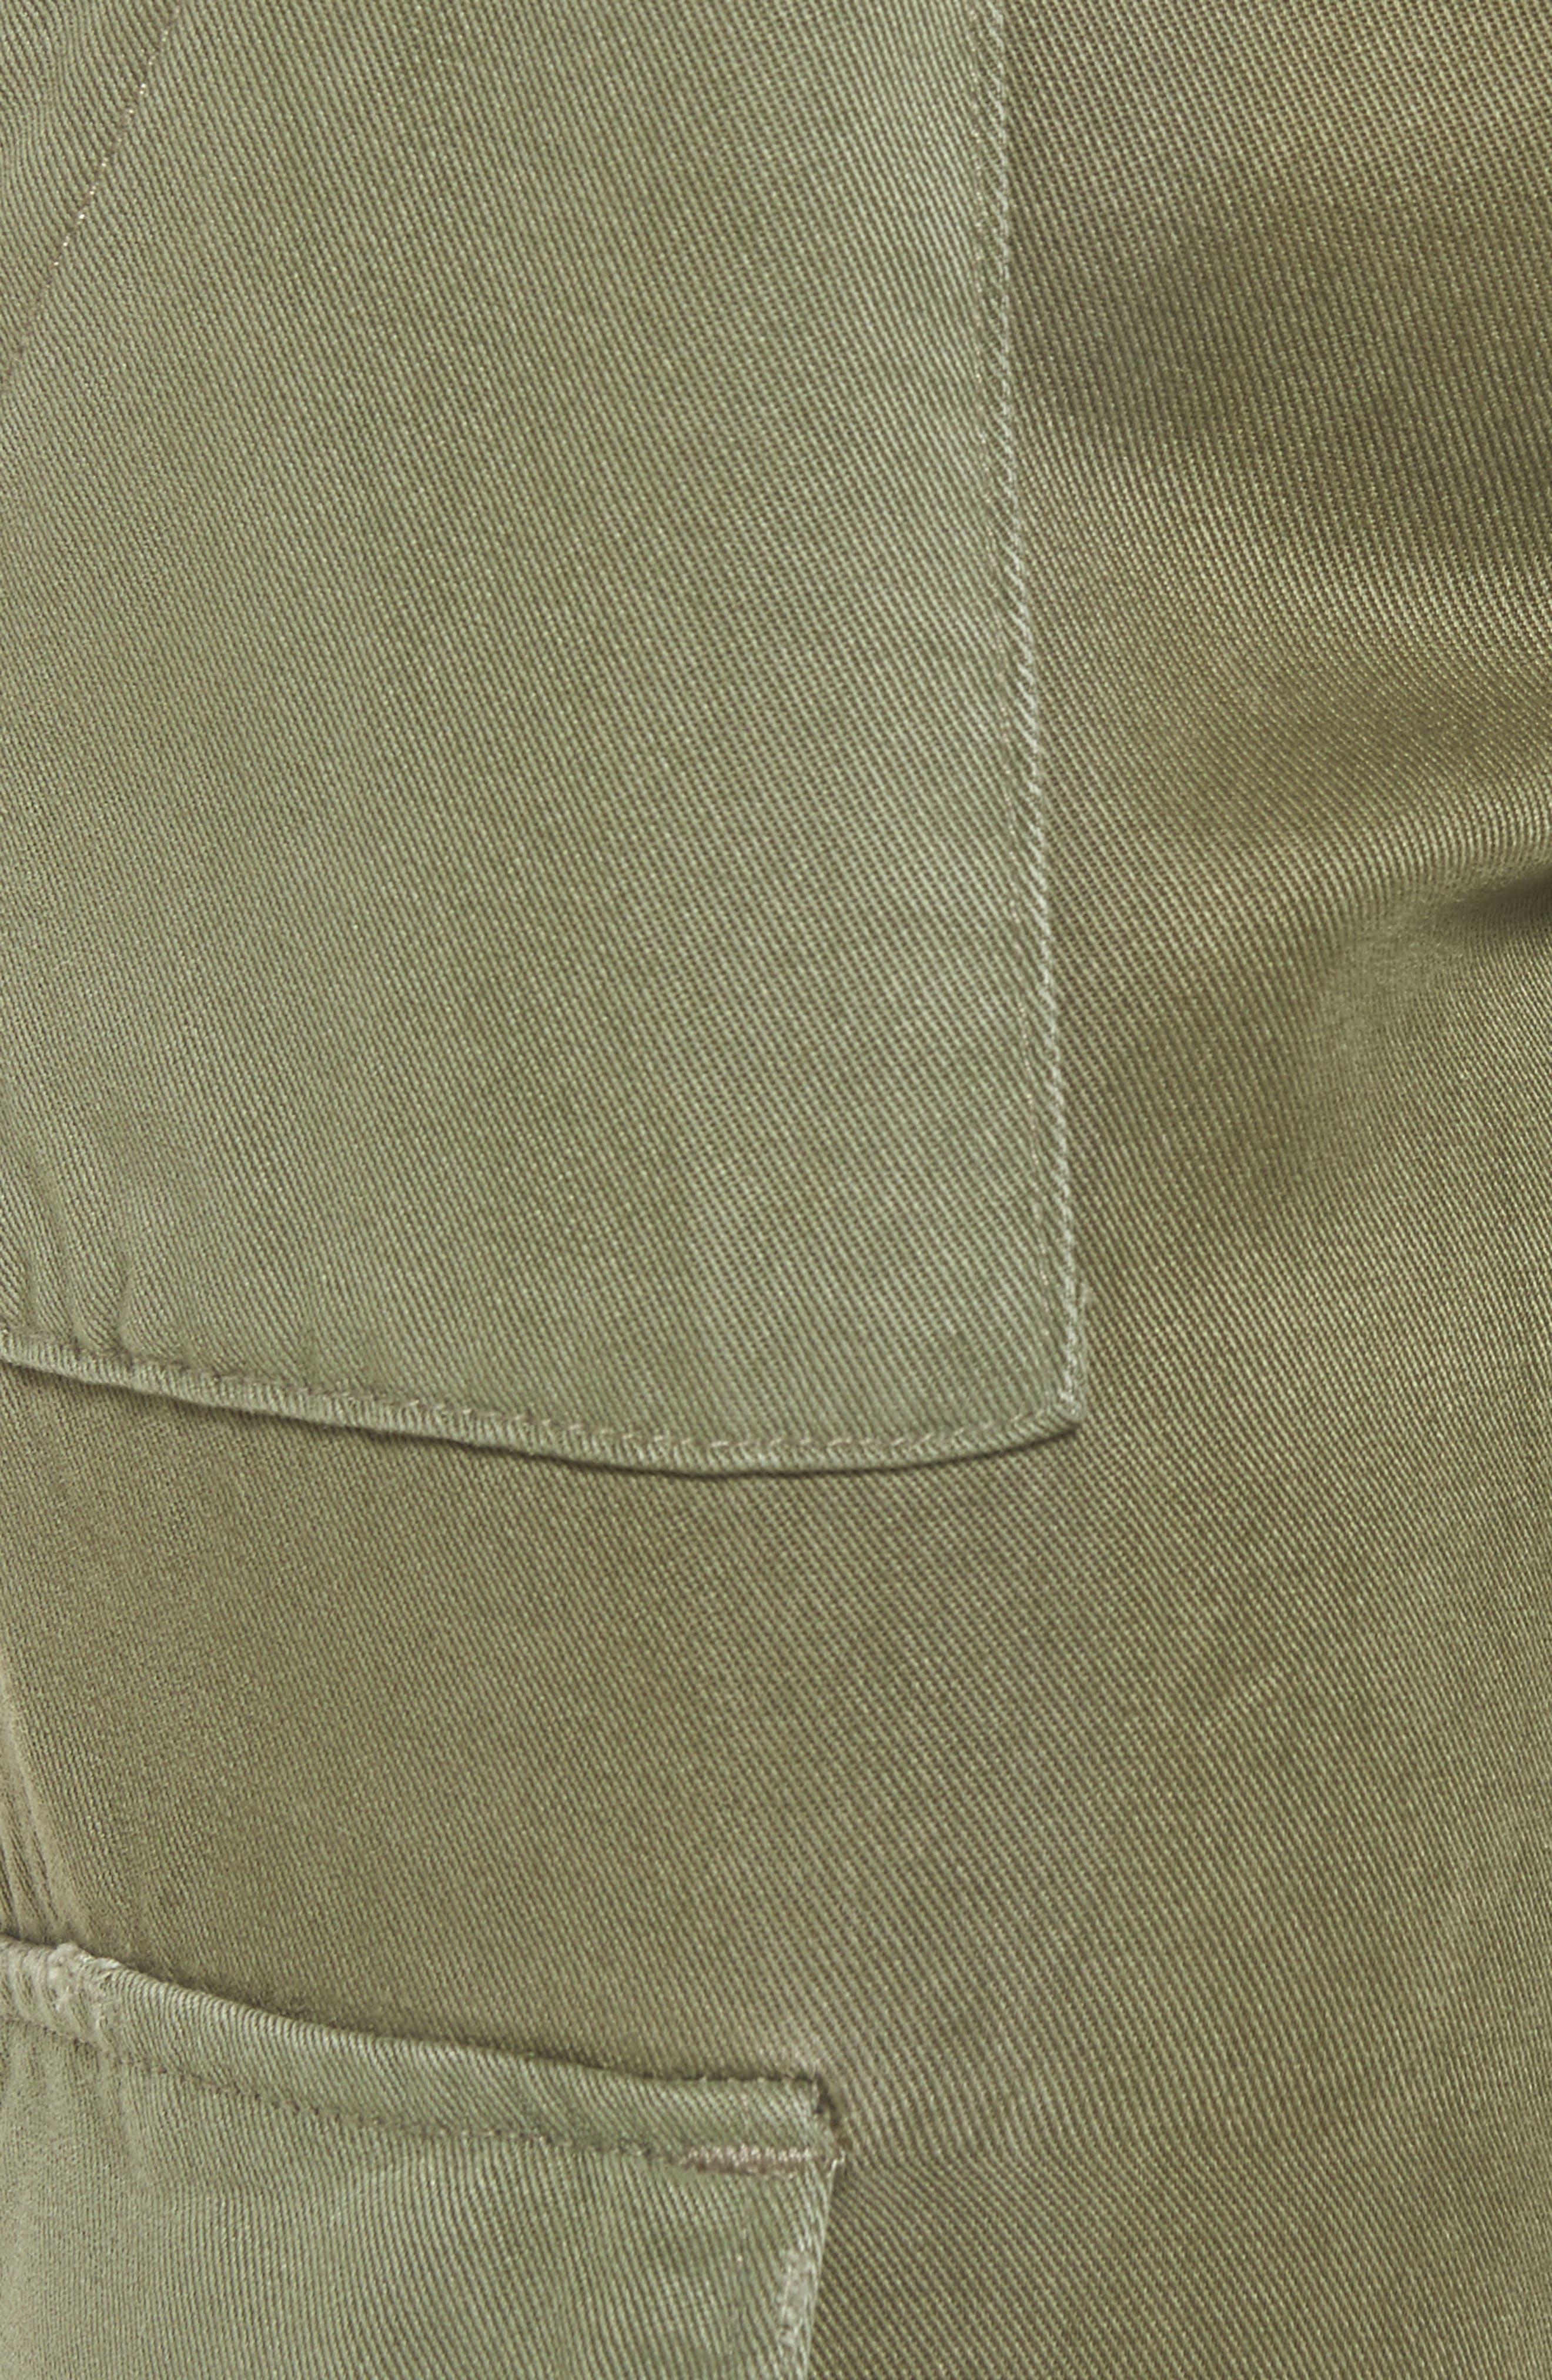 Riley Straight Leg Cargo Pants,                             Alternate thumbnail 5, color,                             Utility Remix